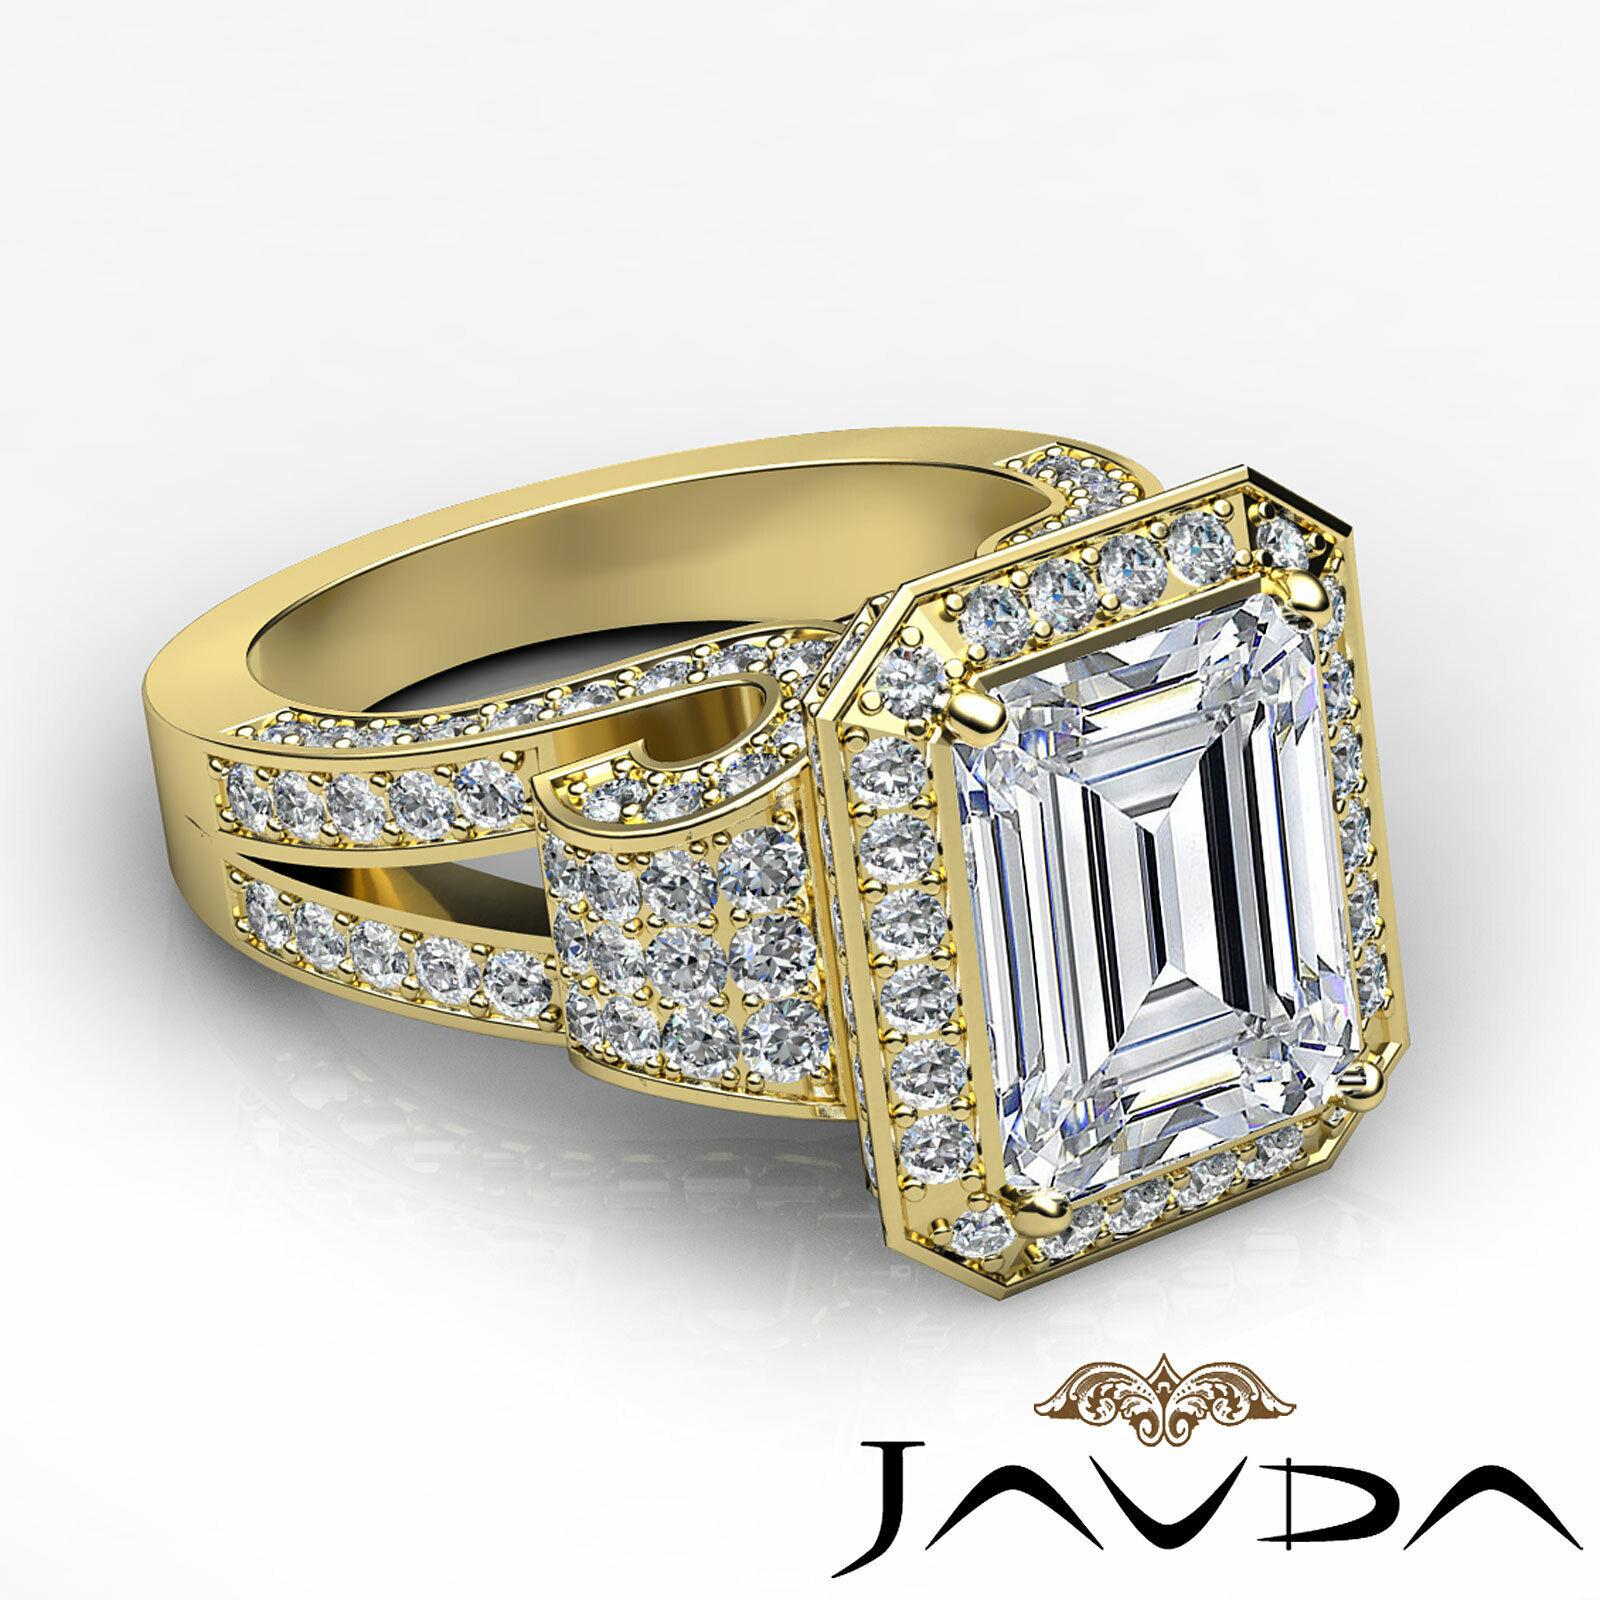 4.4ctw Antique Vintage Halo Emerald Diamond Engagement Ring GIA I-VS1 White Gold 9